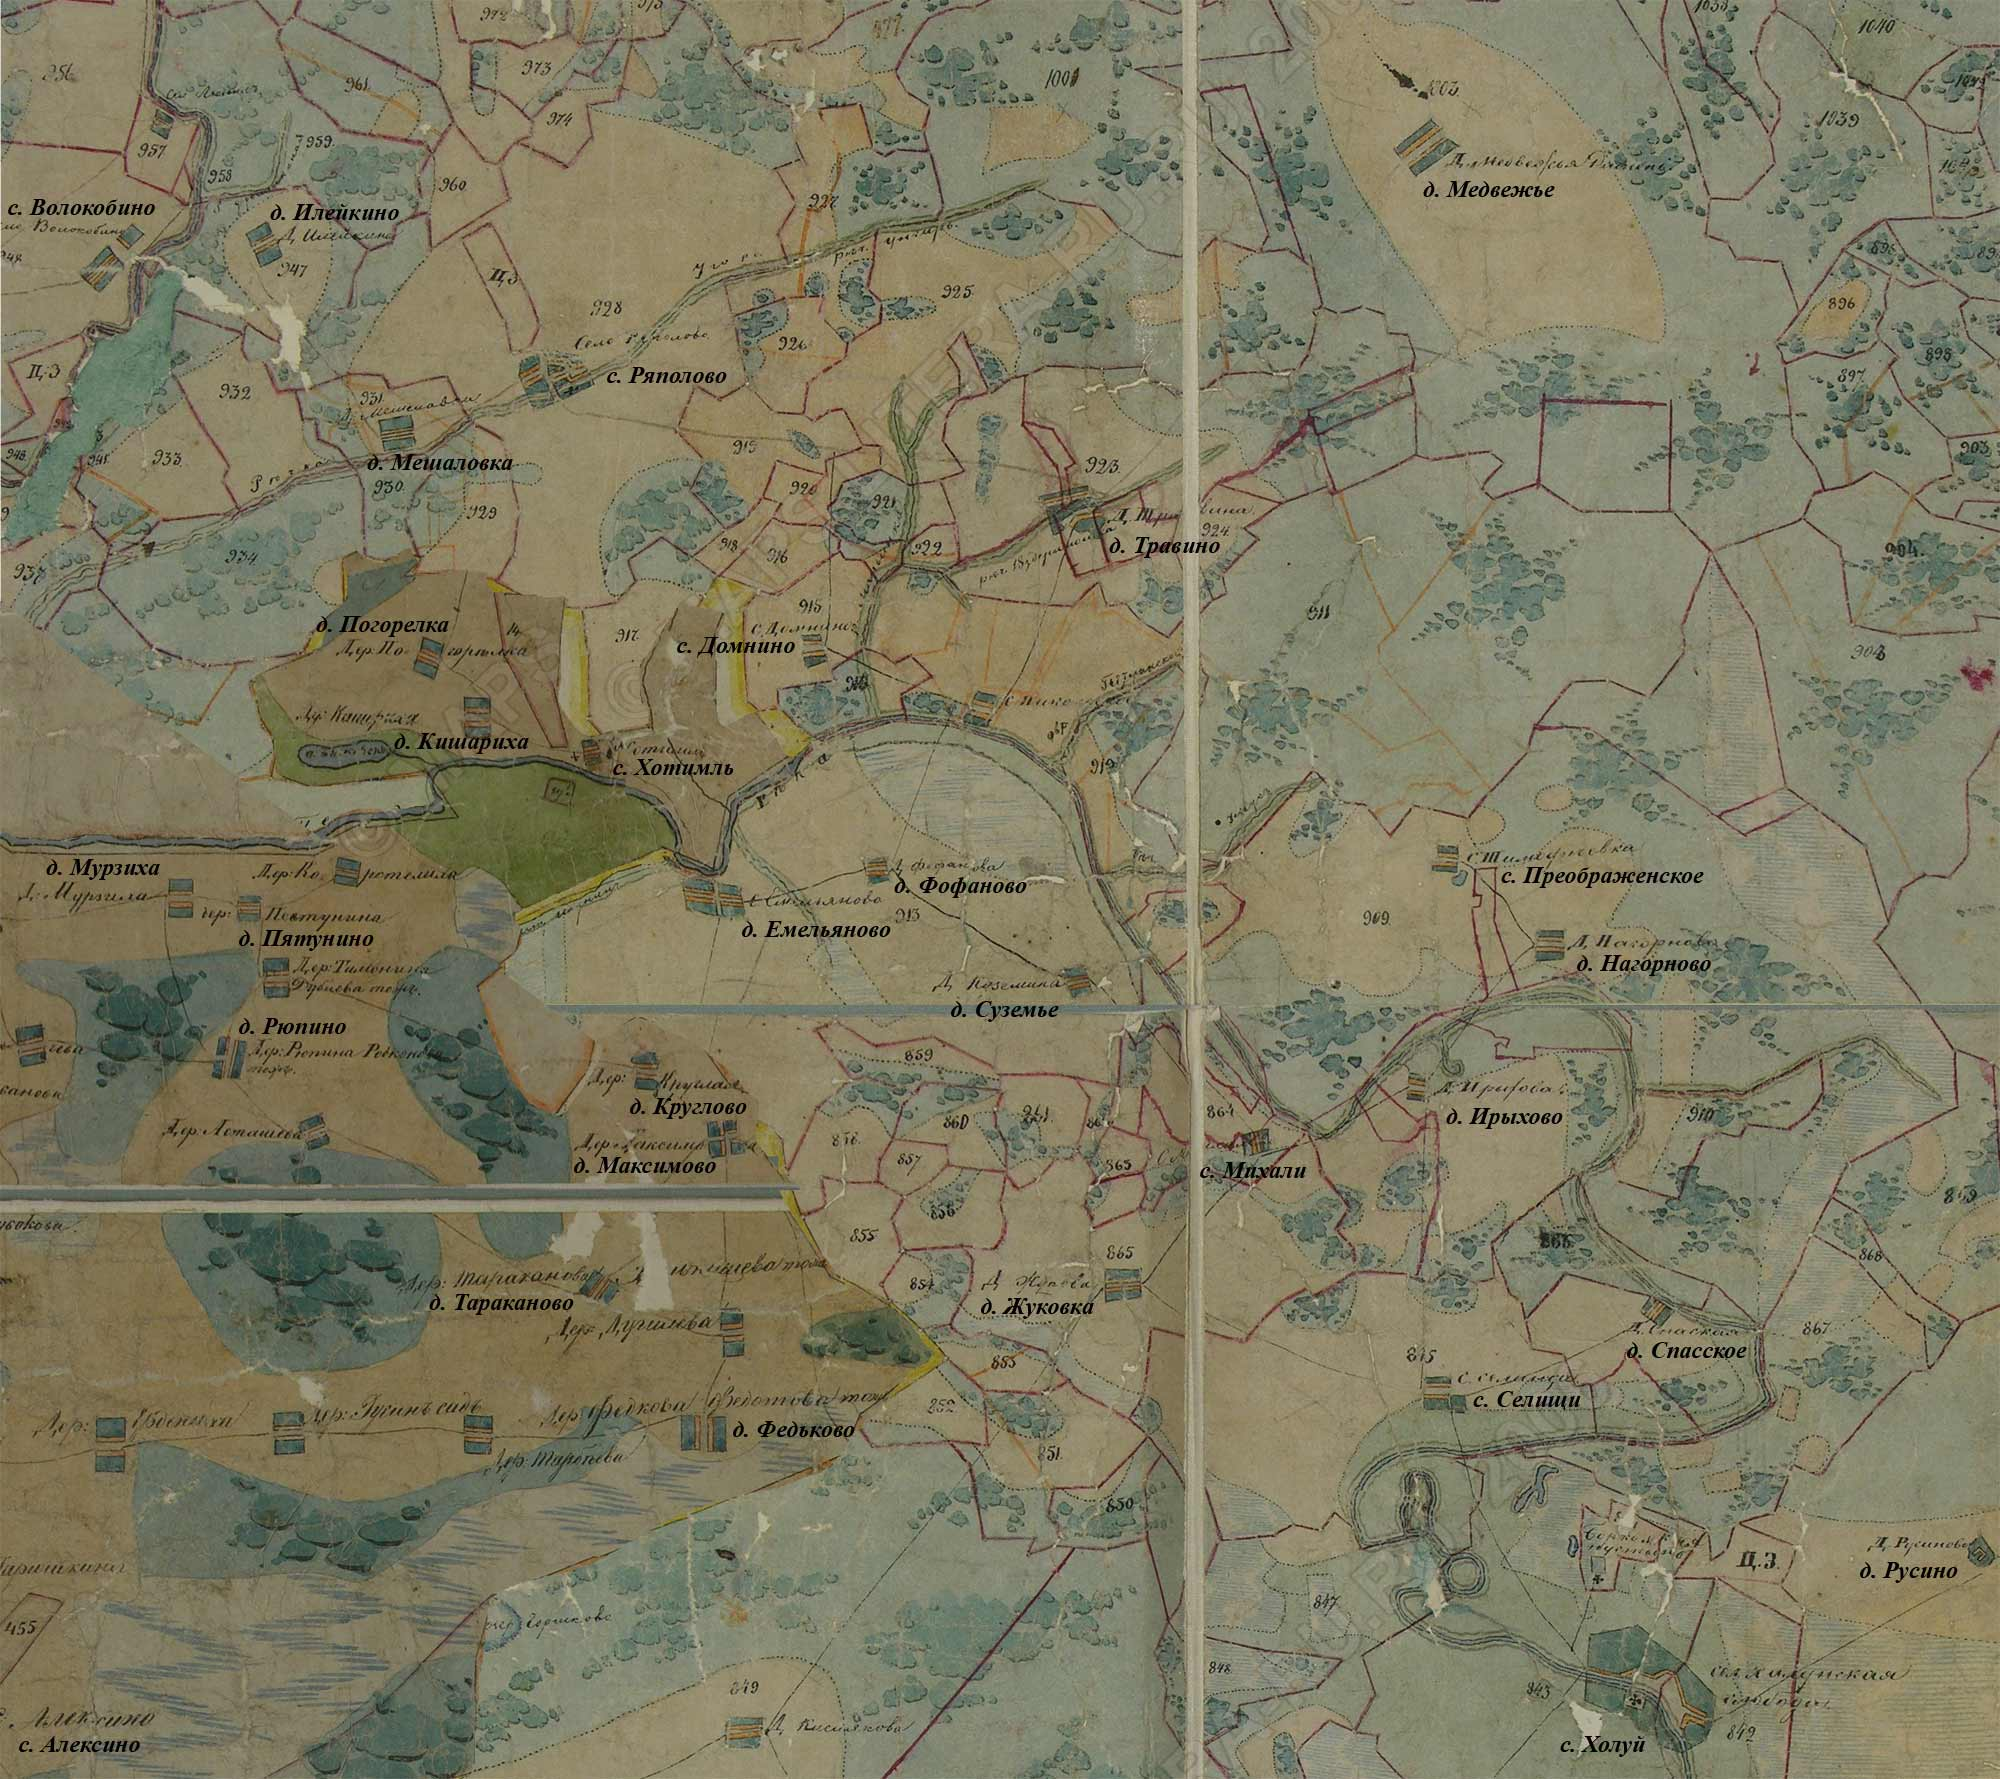 Деревня жуковка на карте